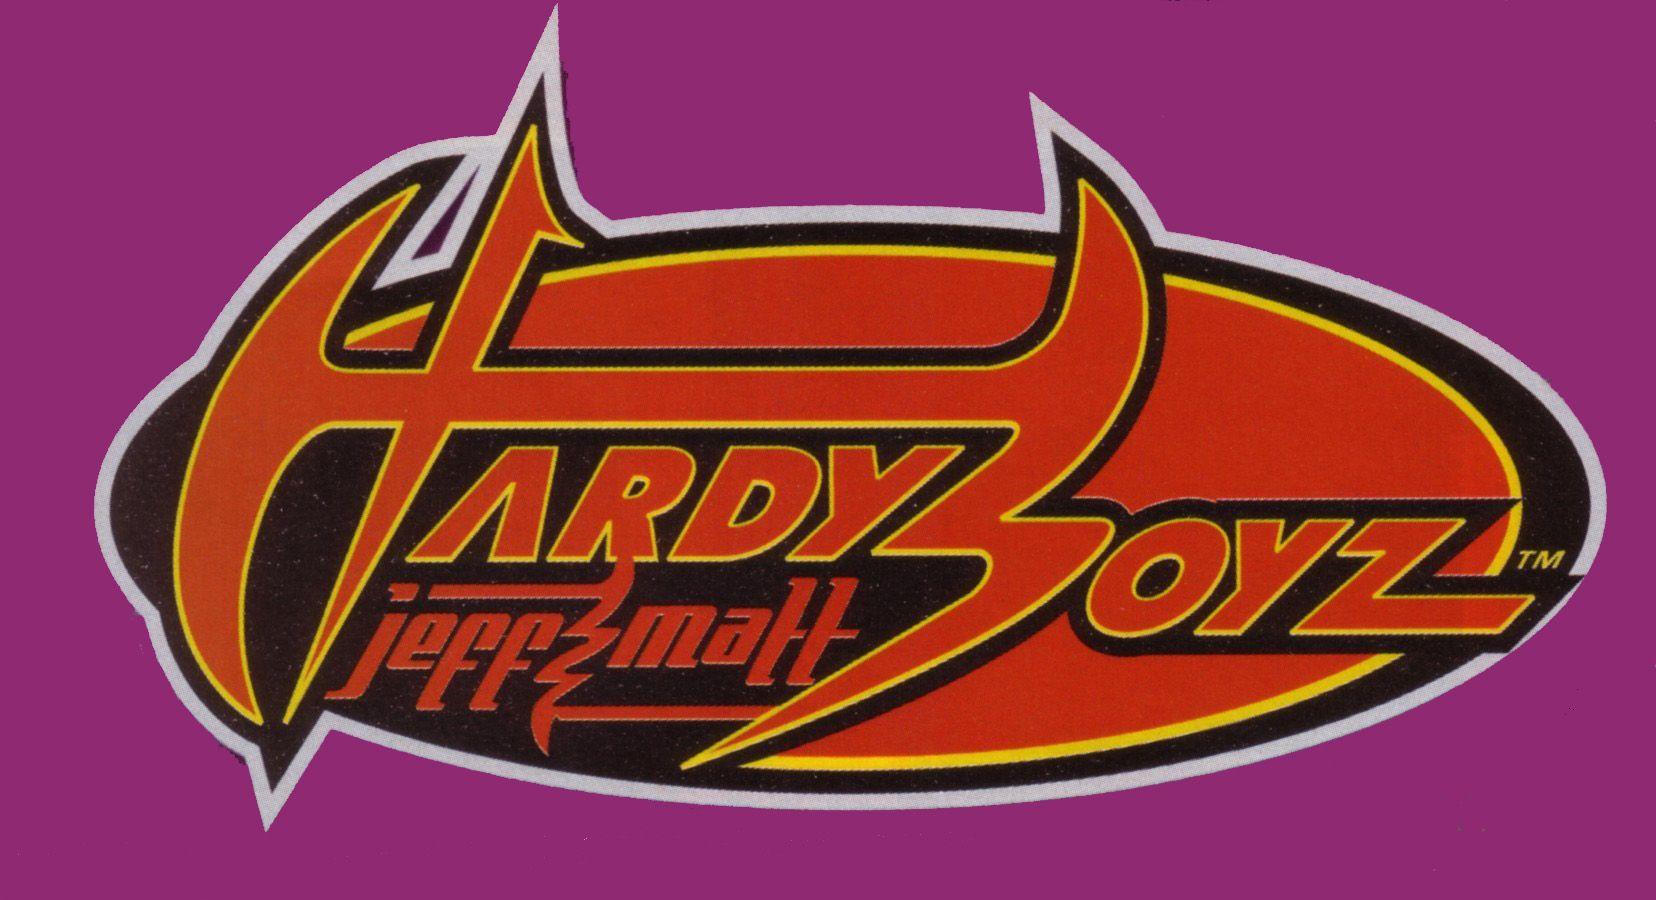 The Hardy Boyz (Matt & Jeff) logo 3 - WWE | wwe logos ...  Wwe